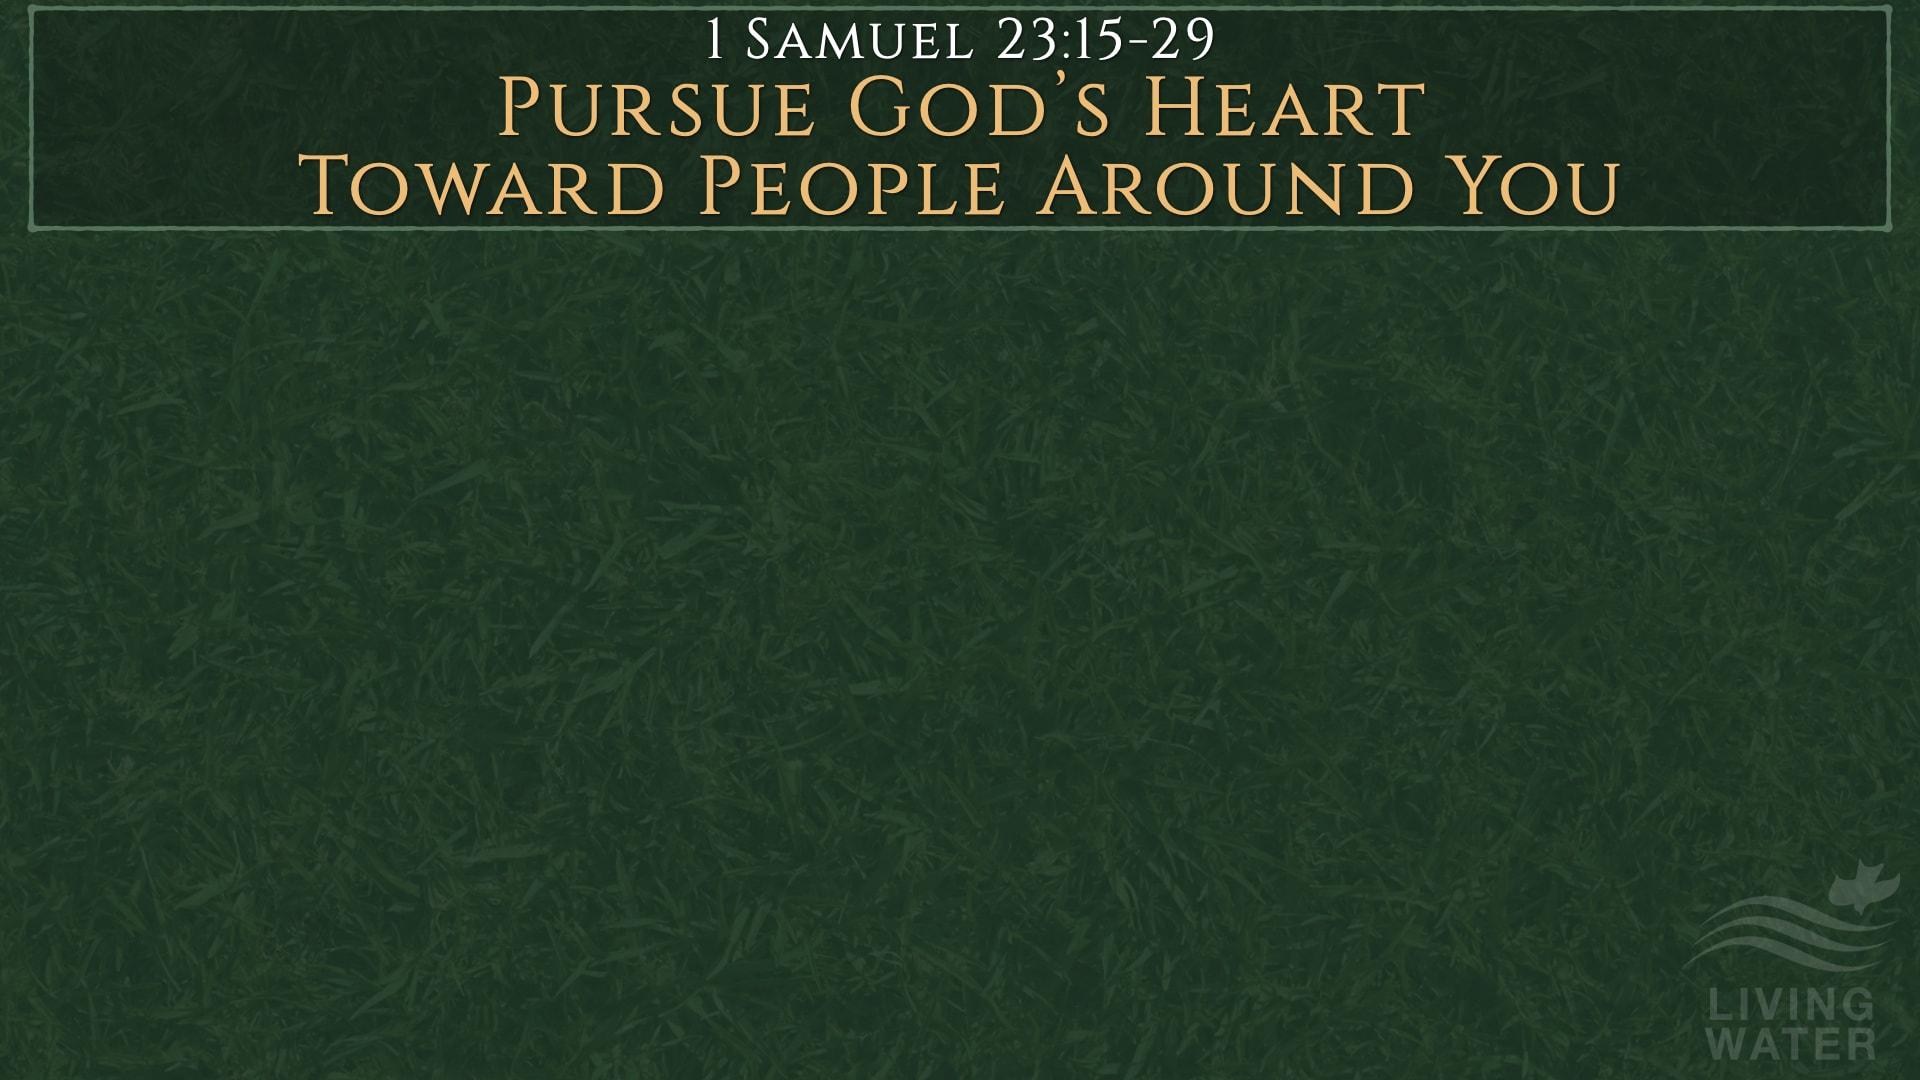 1 Samuel 23:15-29, Pursue God's Heart Toward People Around You